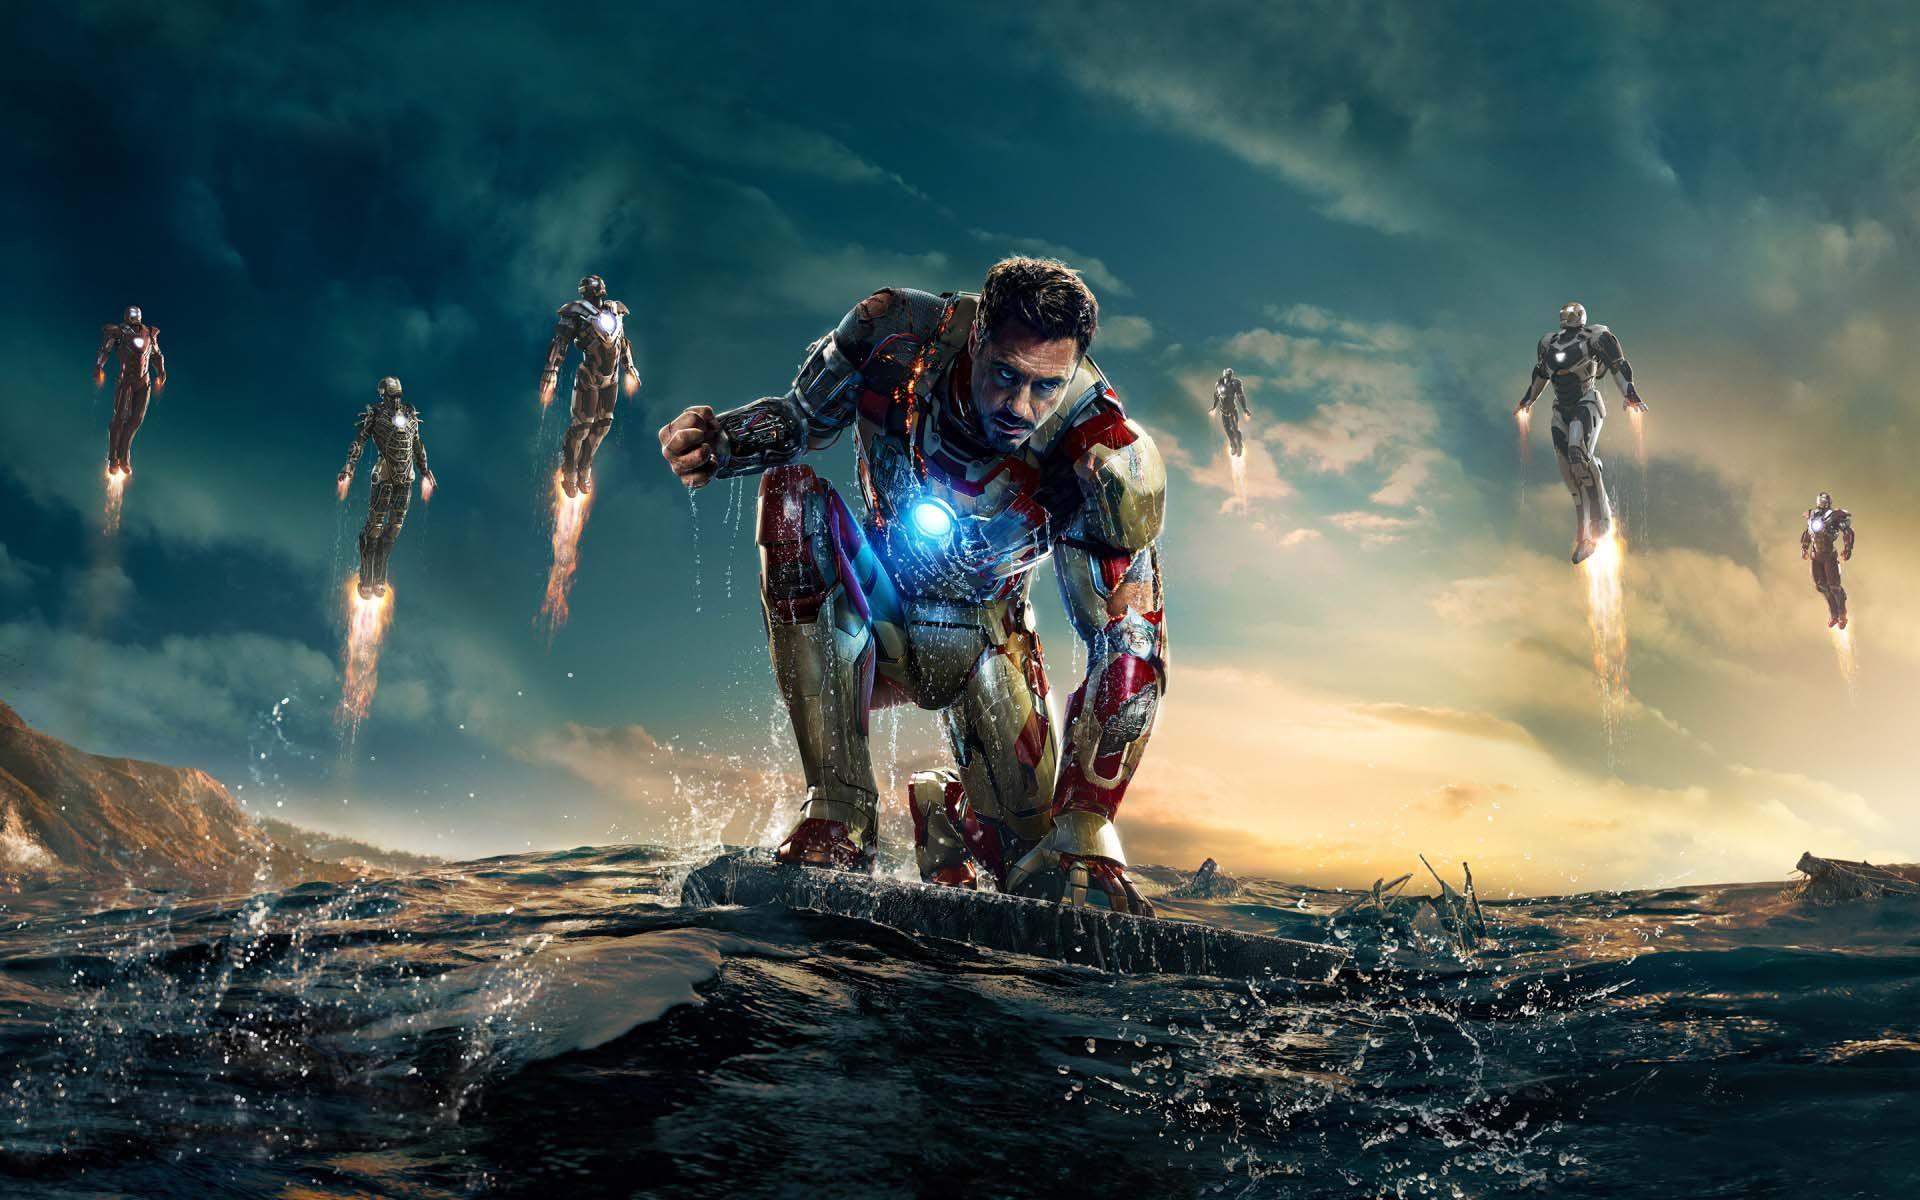 Macbook Pro 15 Inch Google Search Iron Man Pinterest Iron